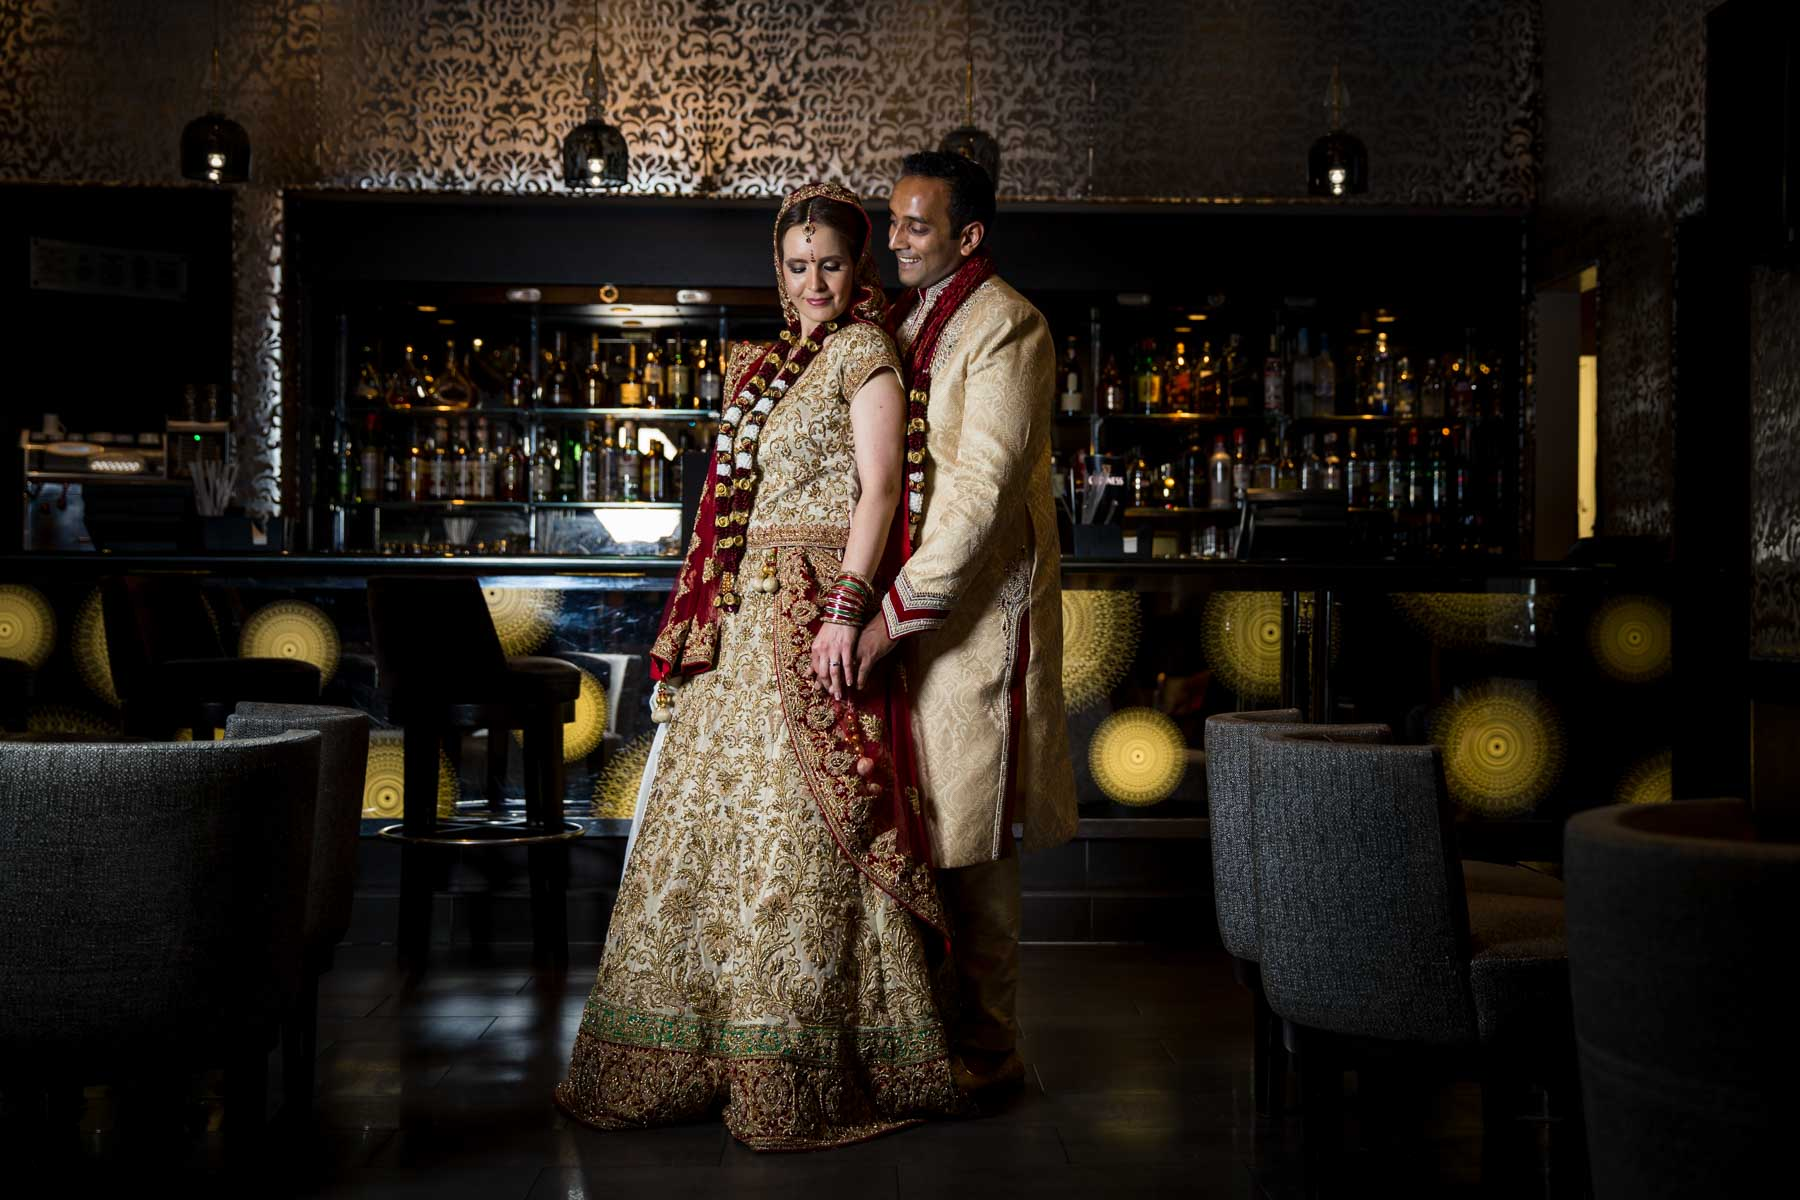 Natural wedding photographer London, Raddison Blu Edwardian Heathrow